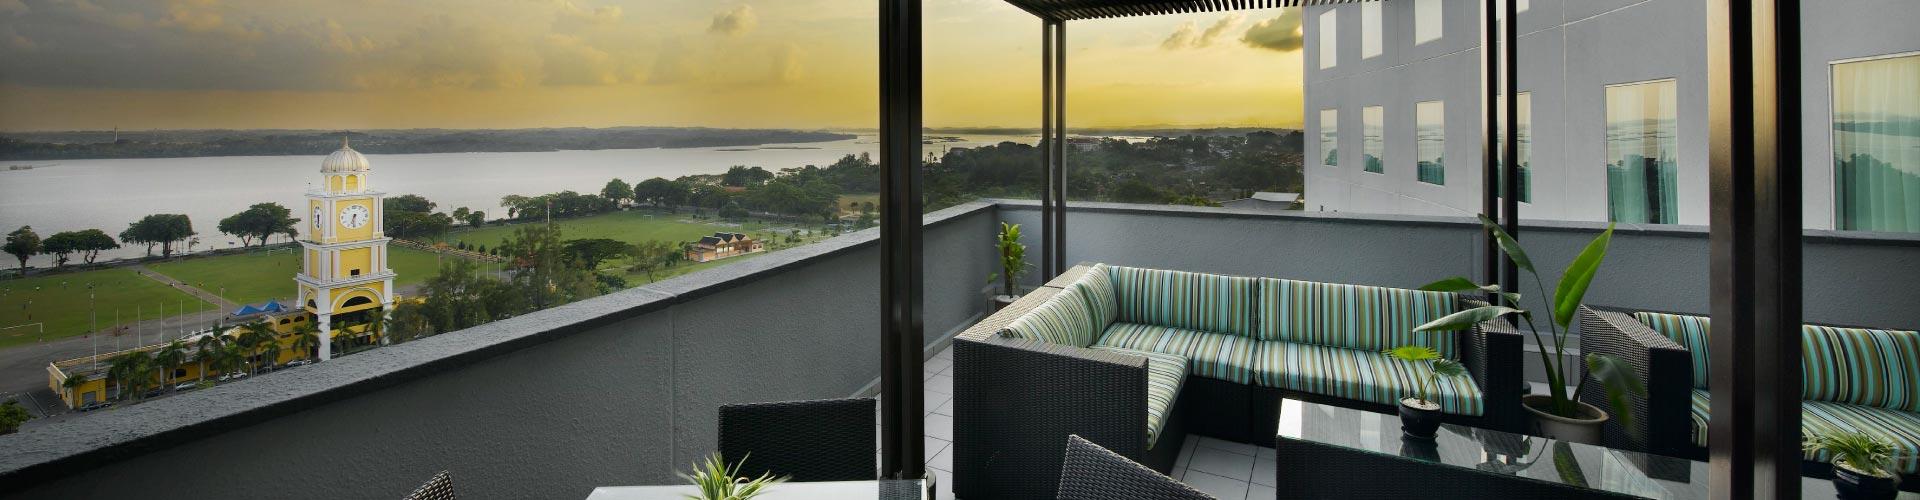 Thistle Johor Bahru Hotel Package